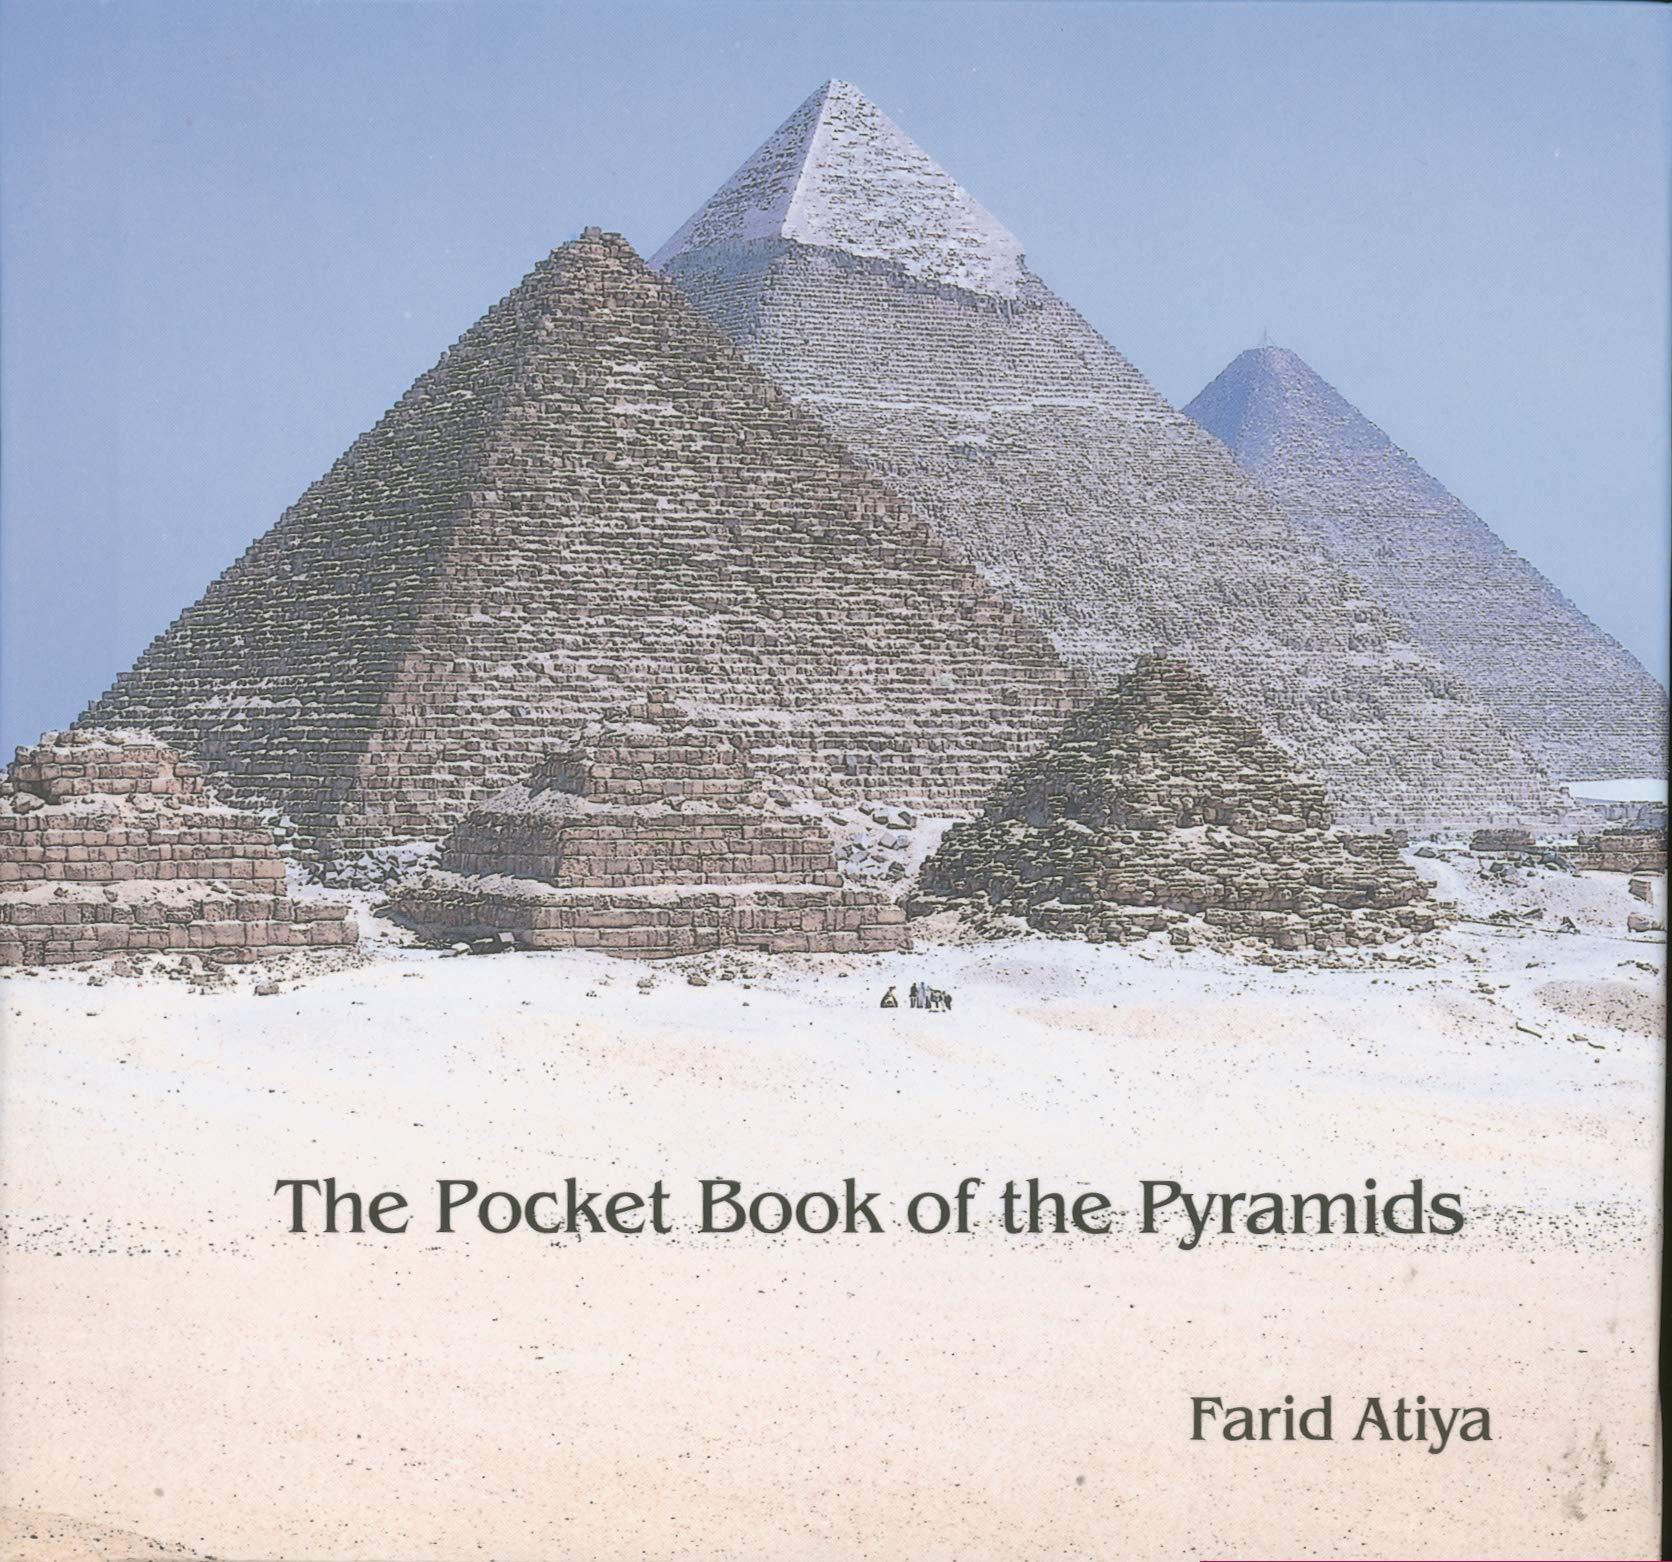 Pocket Book of the Pyramids Travel Literature & Guide Books Idioma Inglés: Amazon.es: Atiya, Farid: Libros en idiomas extranjeros